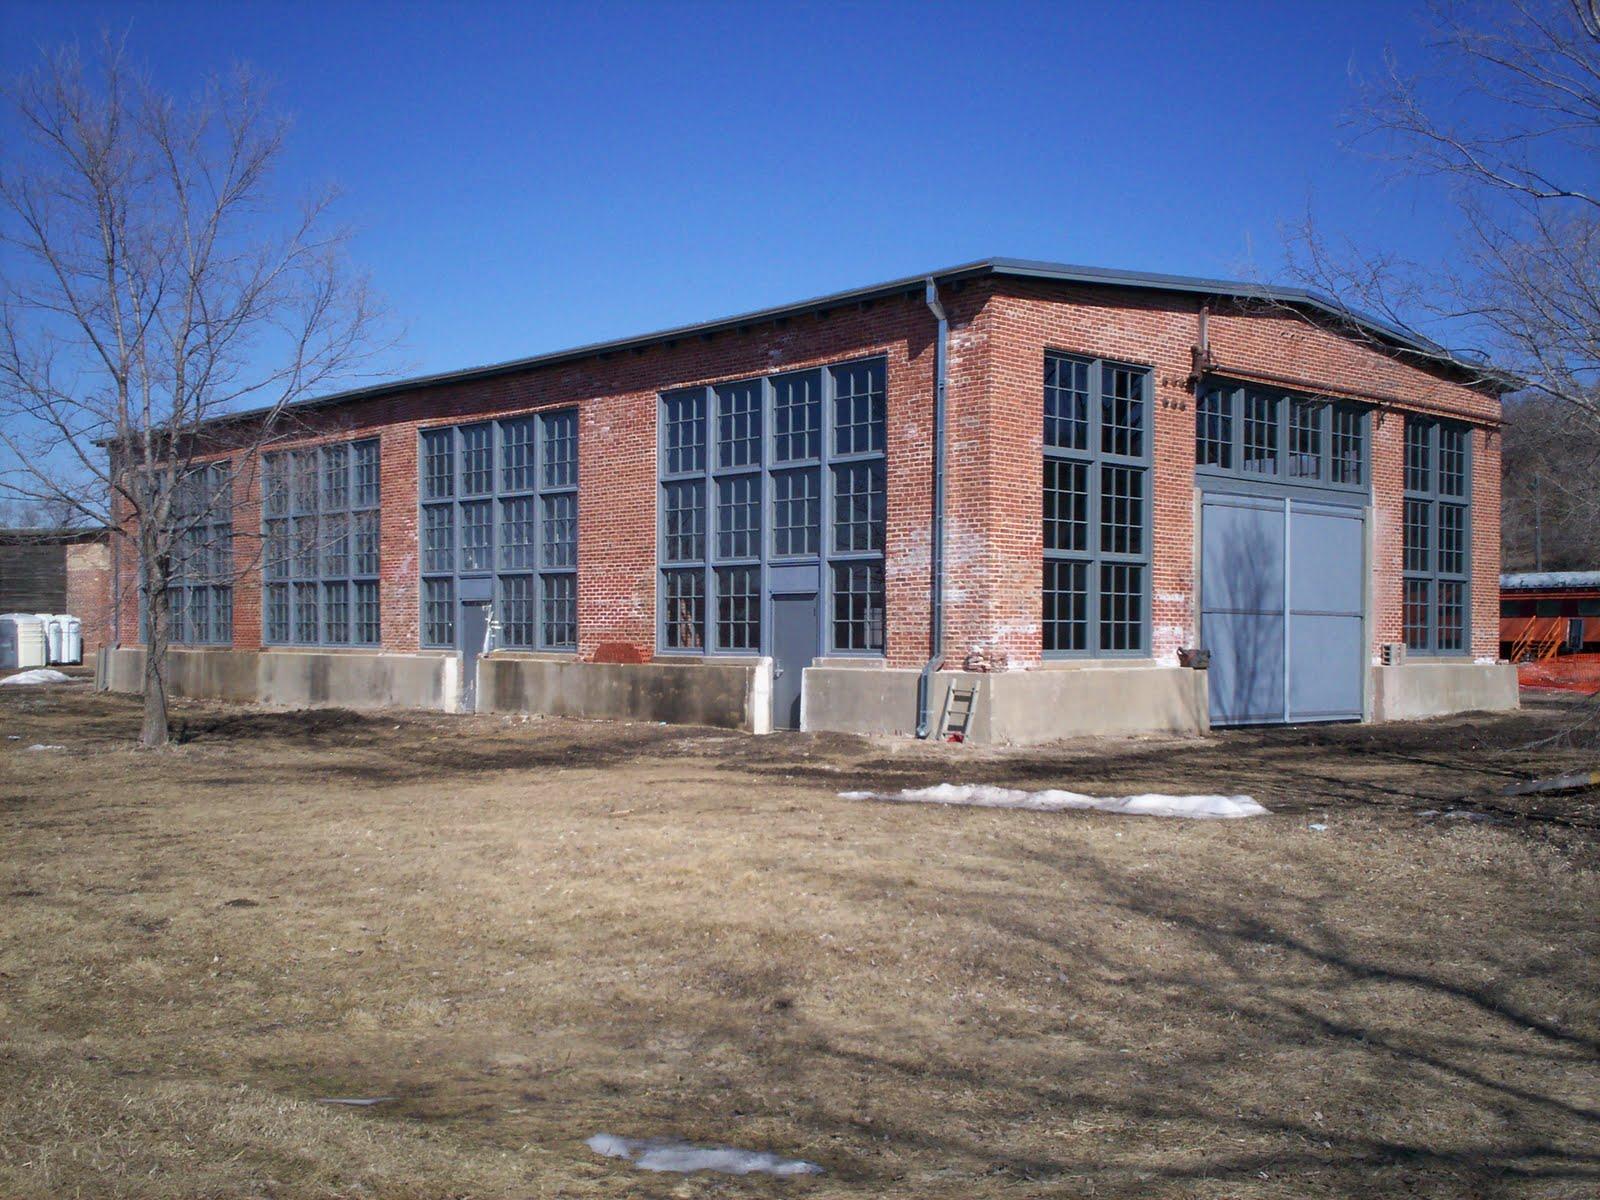 The blacksmith/machine shop in 2010 before restoration